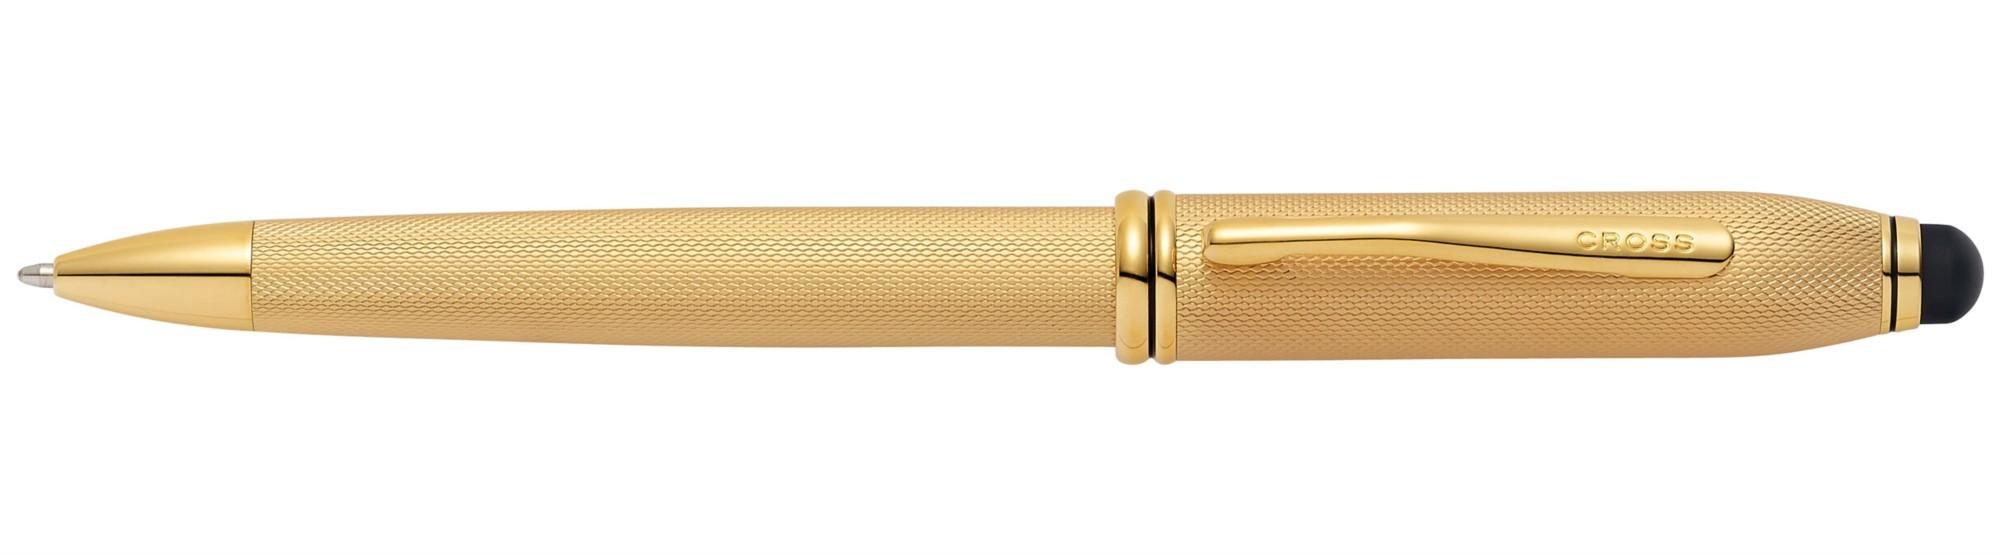 Шариковая ручка со стилусом Townsend Engraved Stylus